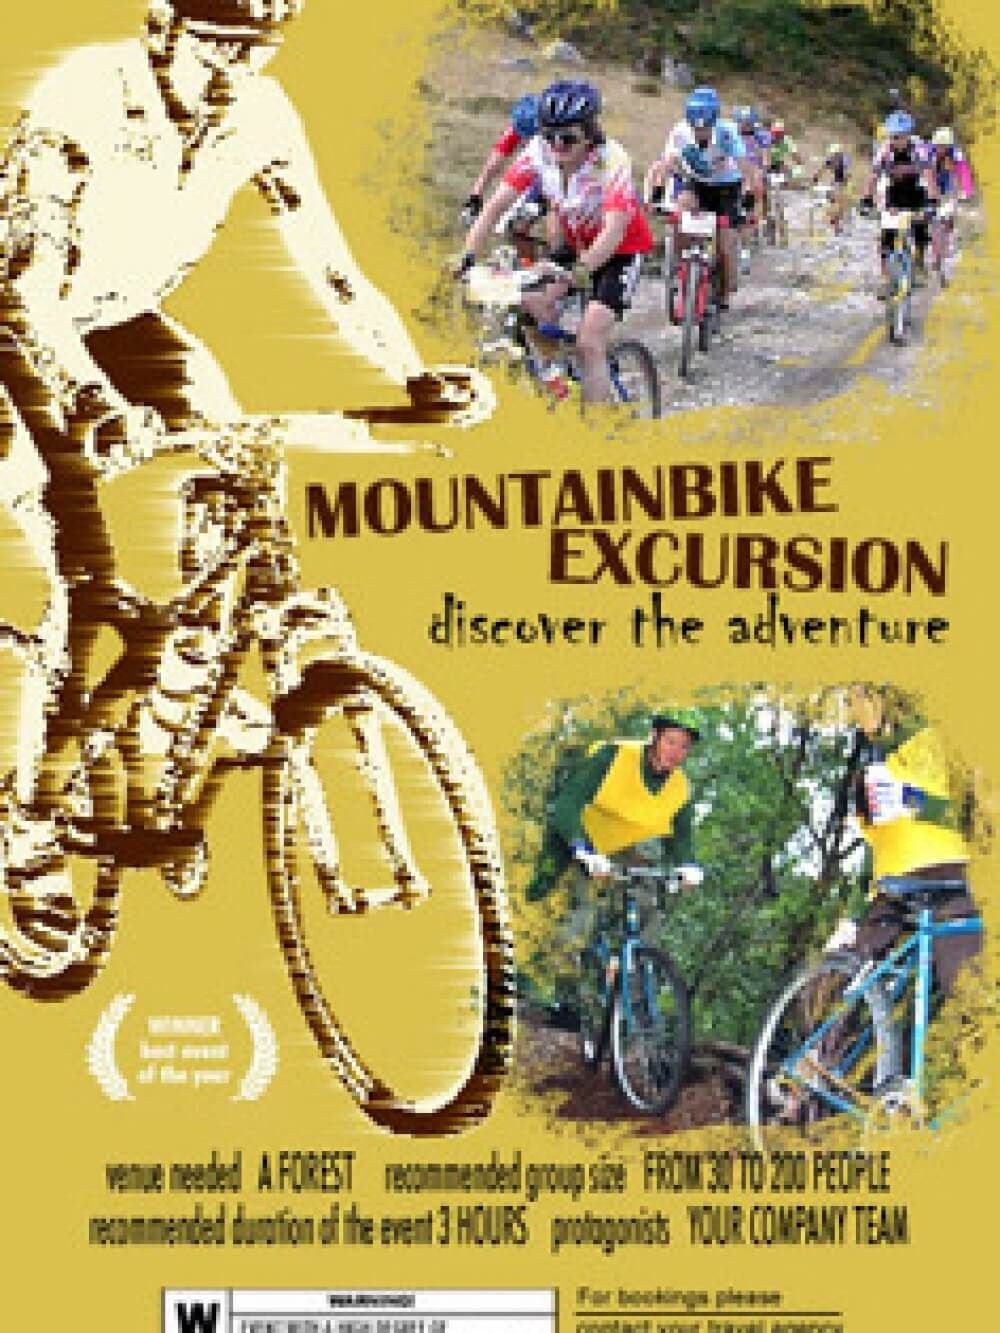 mountainbike_excursion_vertical_web